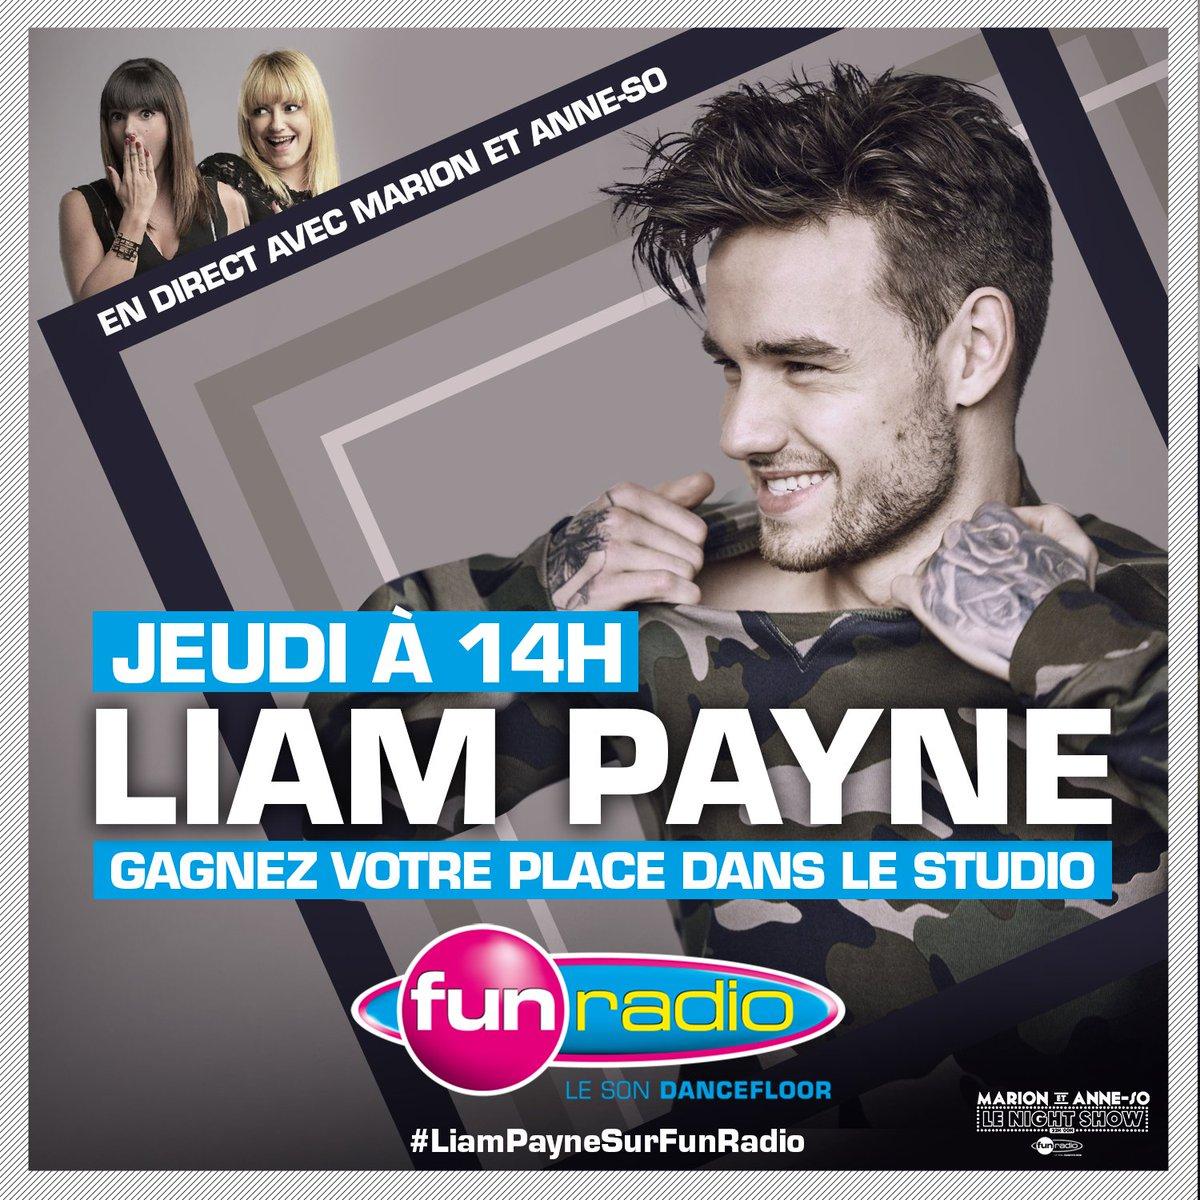 #LiamPayneSurFunRadio